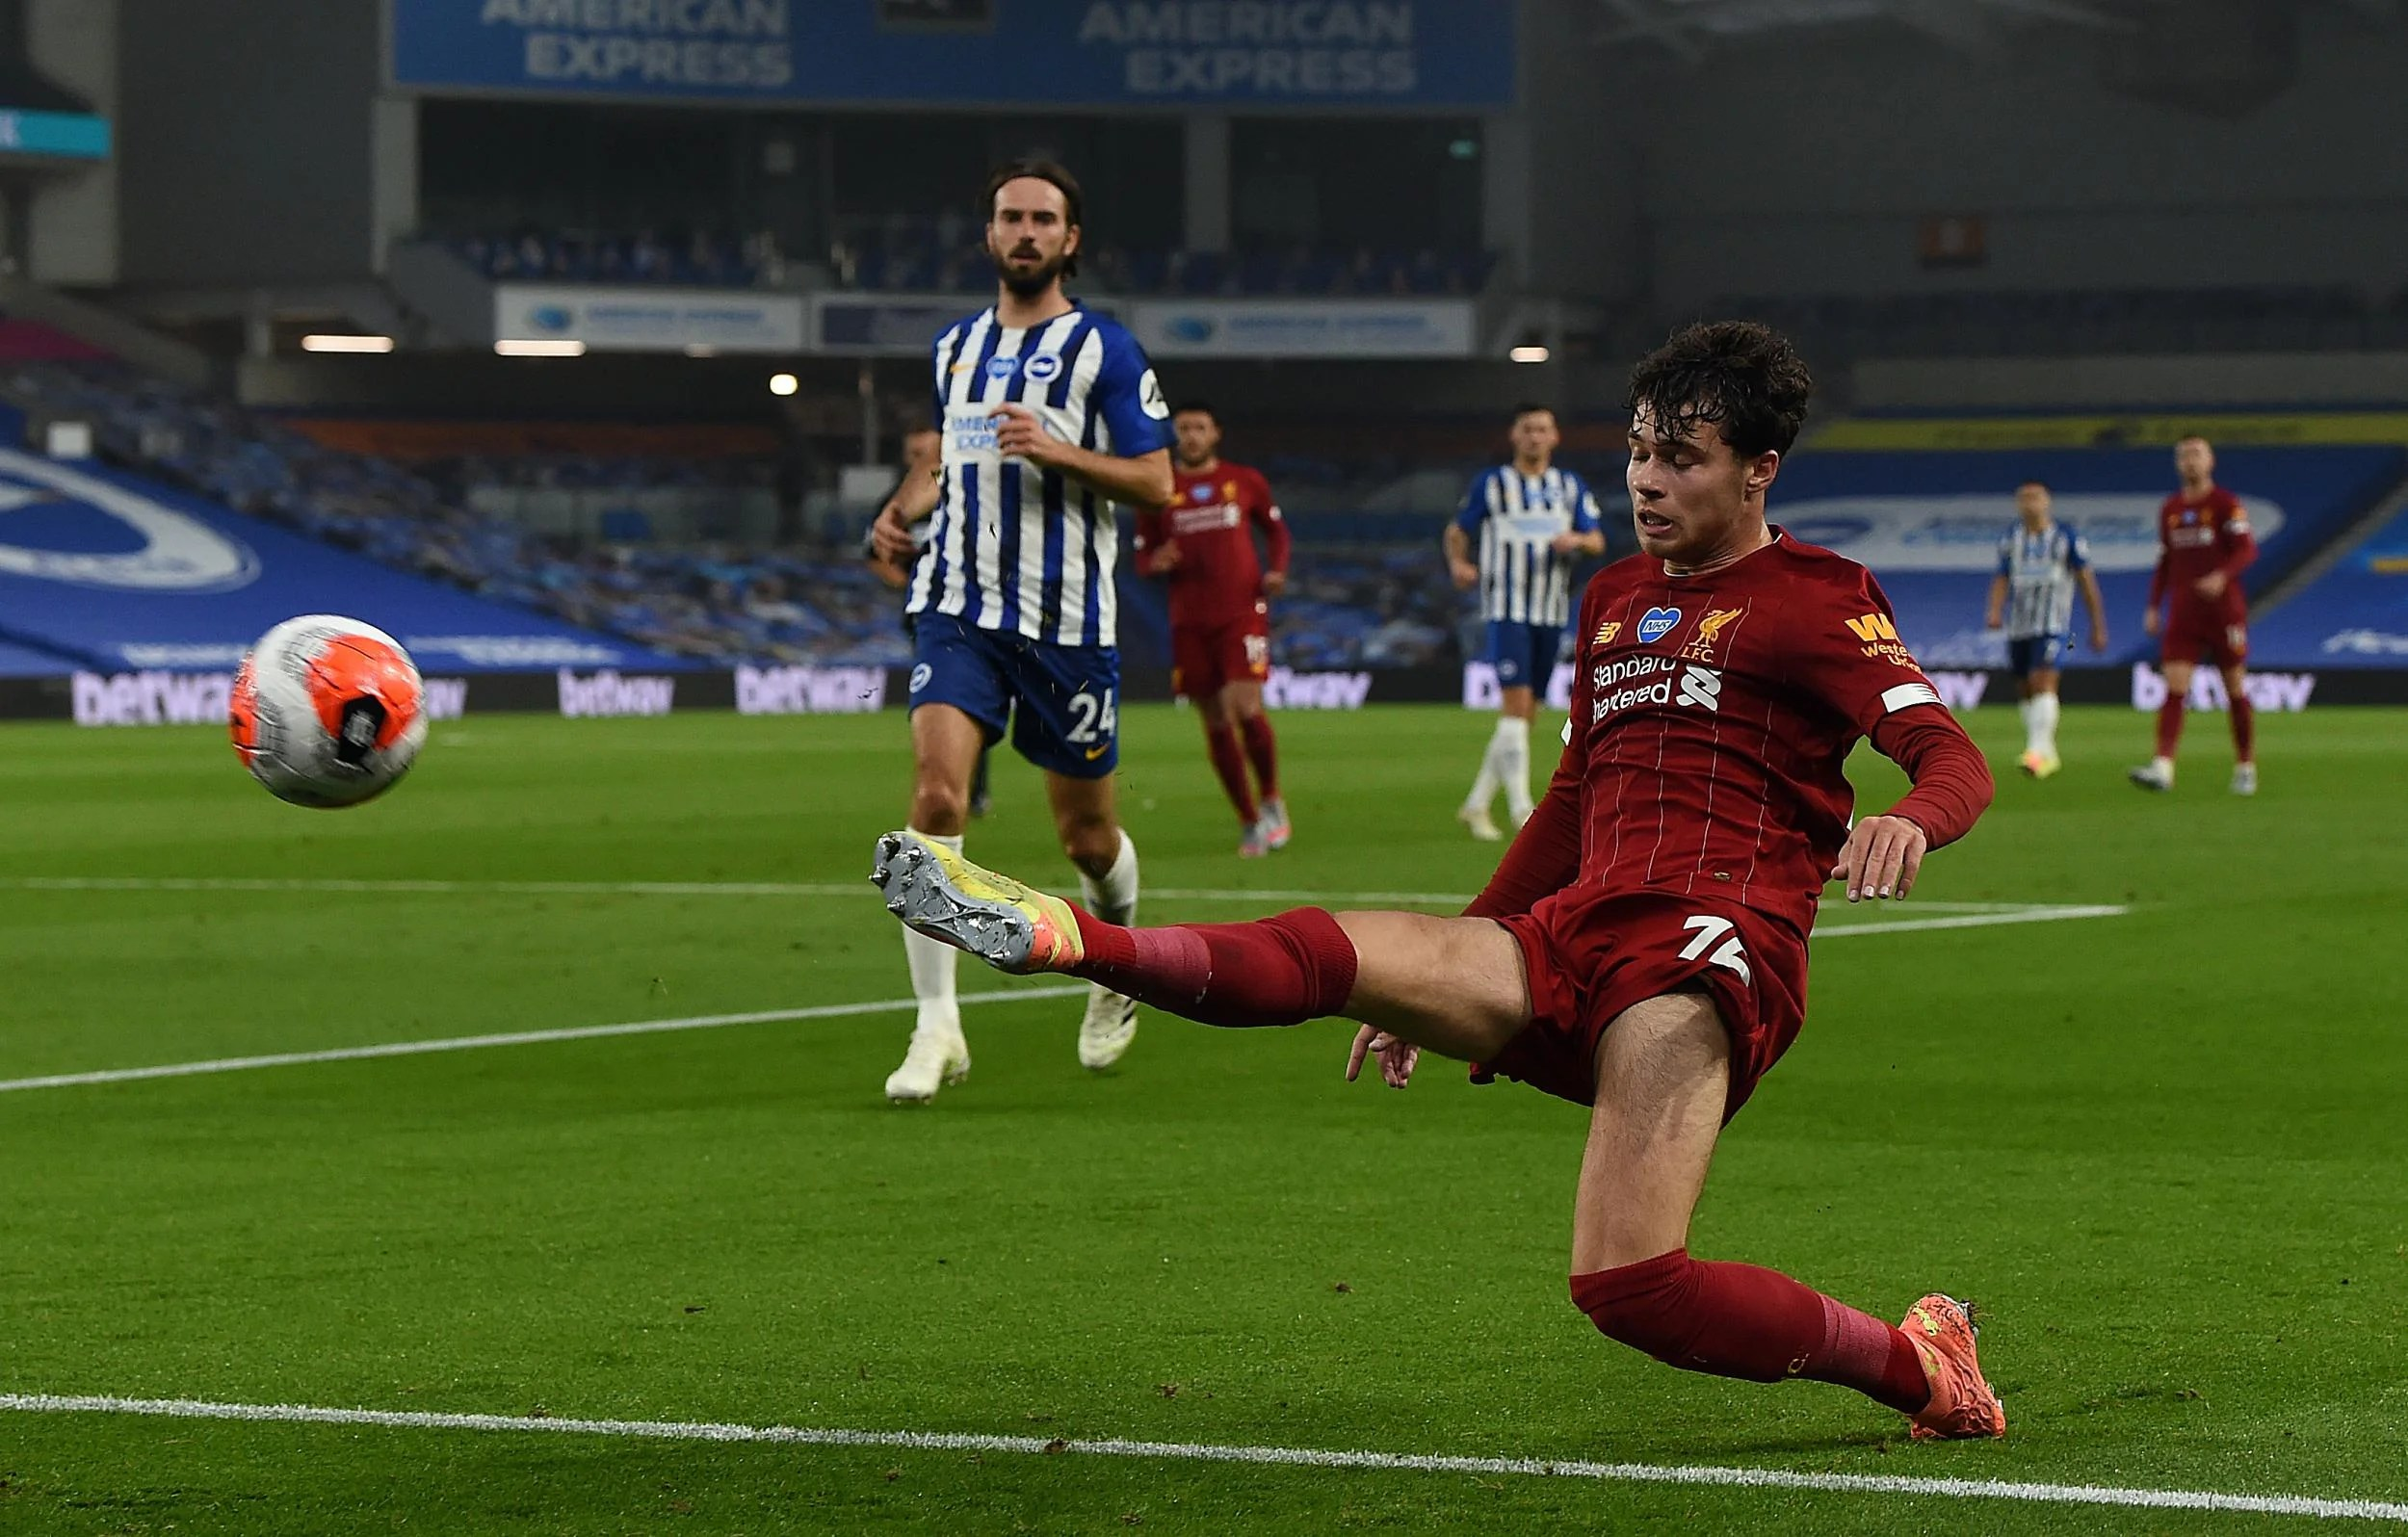 Jurgen Klopp pleased with Liverpool debutant Neco Williams despite half-time substitution 6